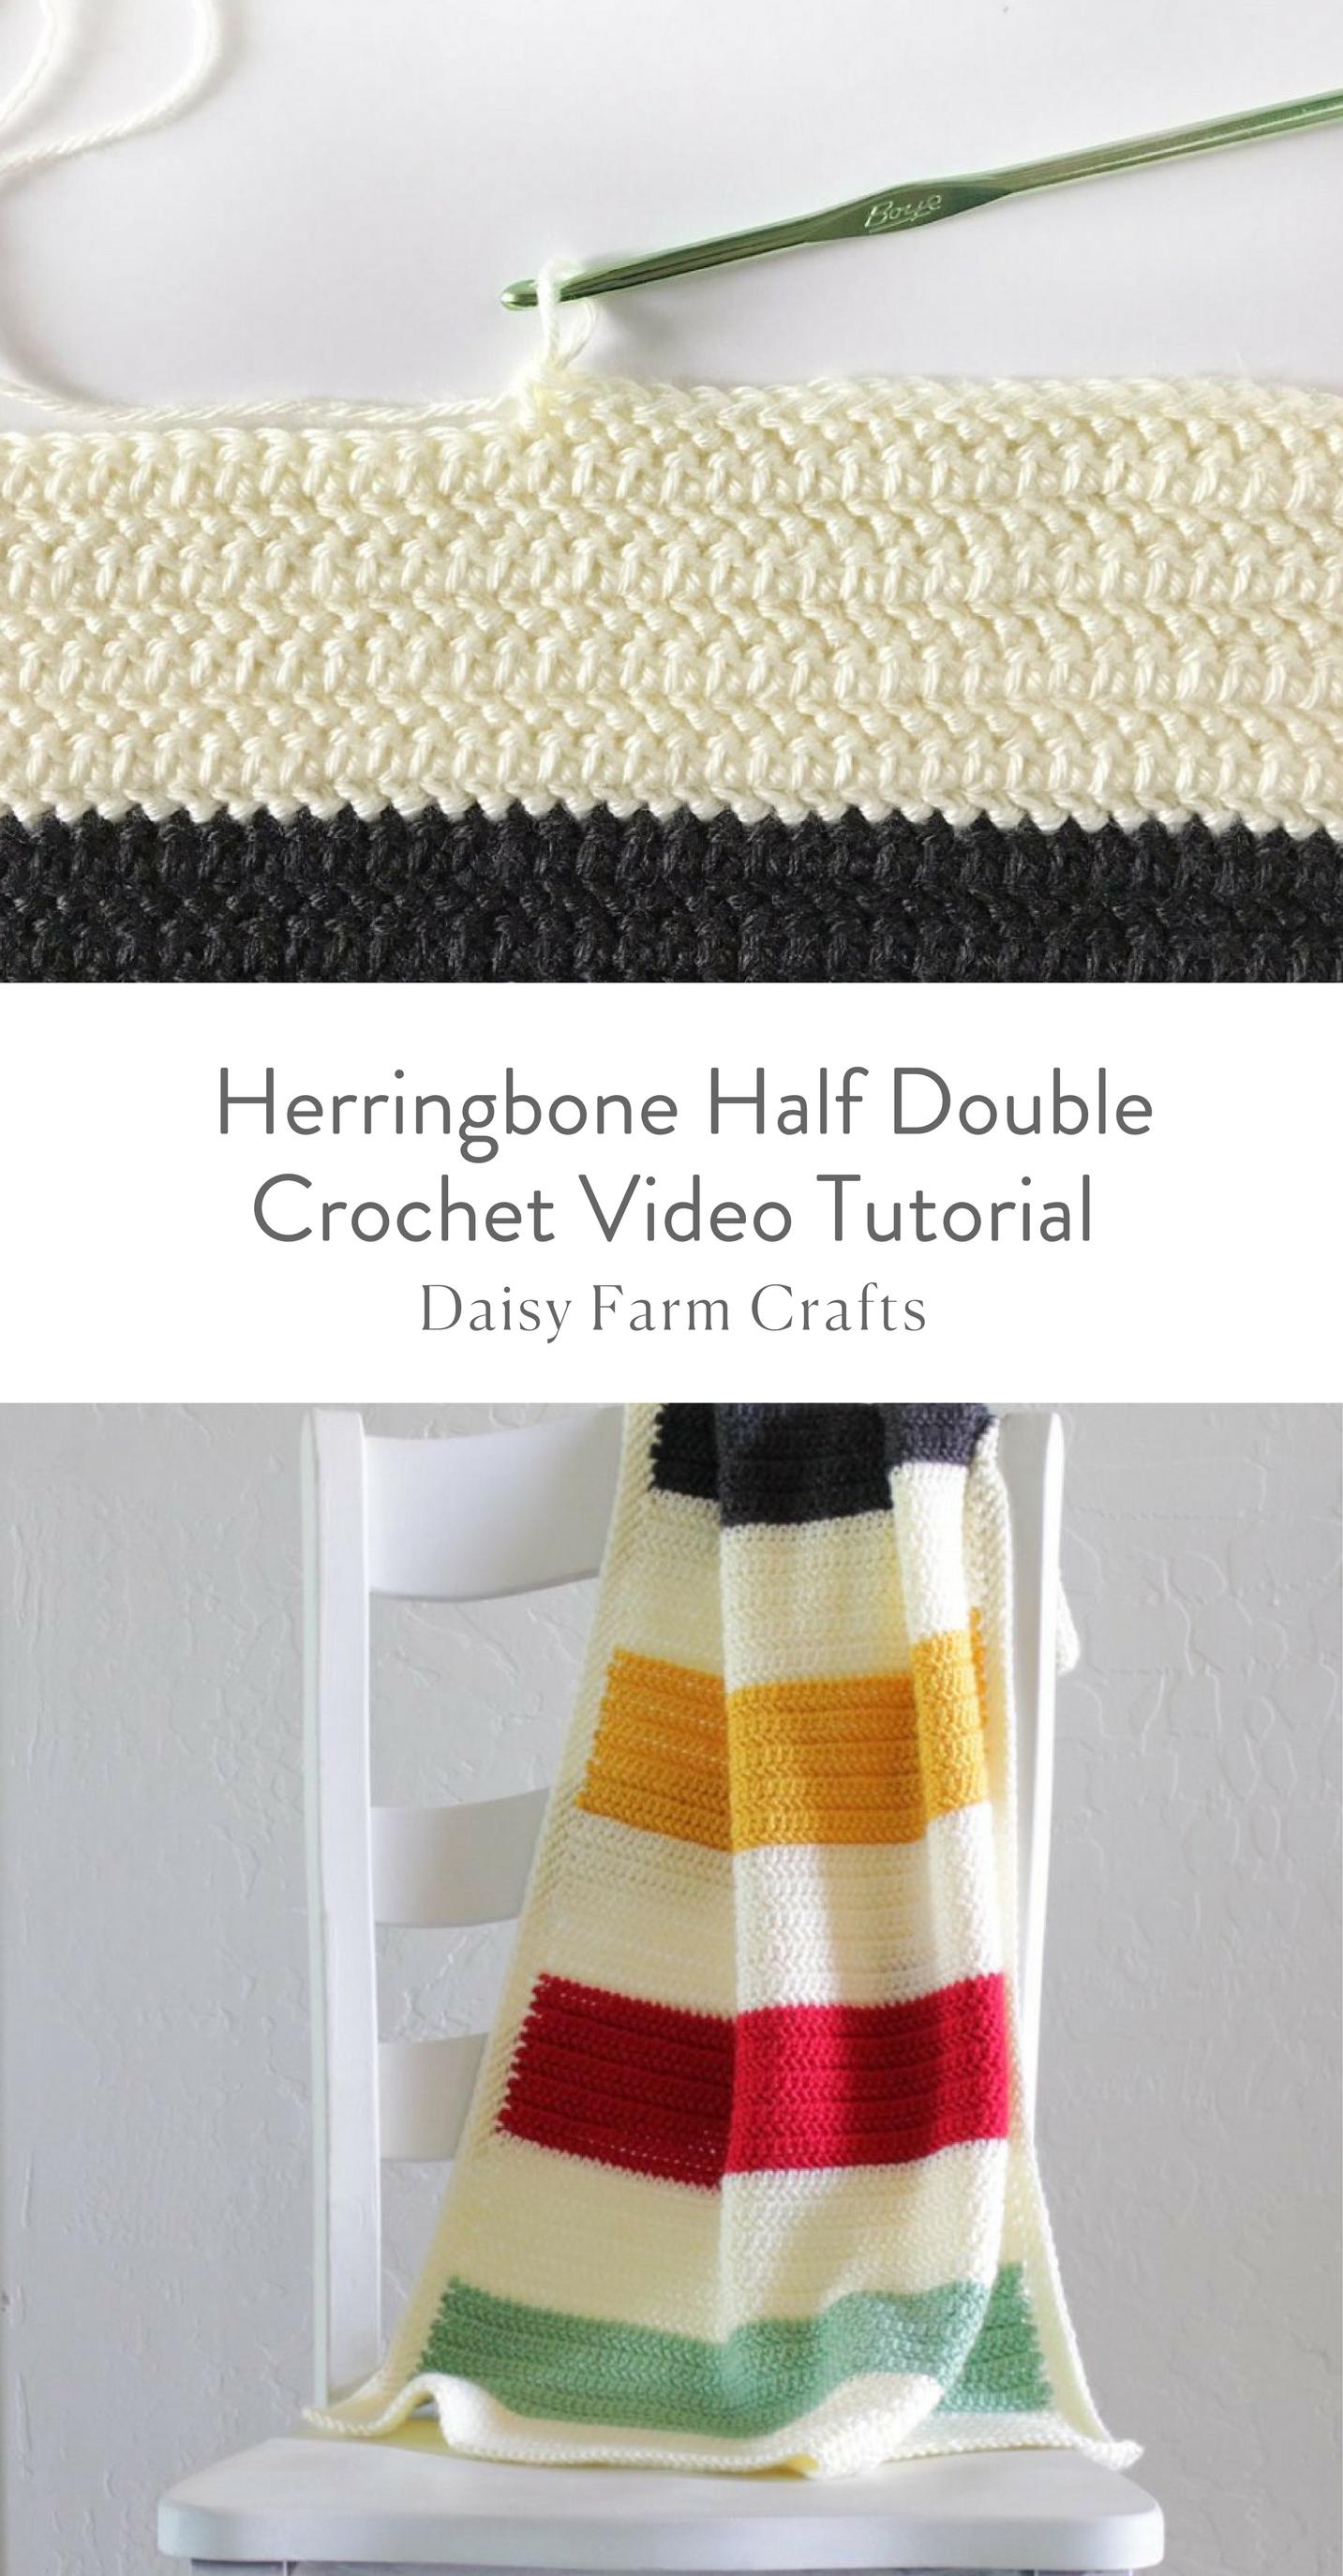 Herringbone Half Double Crochet Video Tutorial | crochet | Pinterest ...